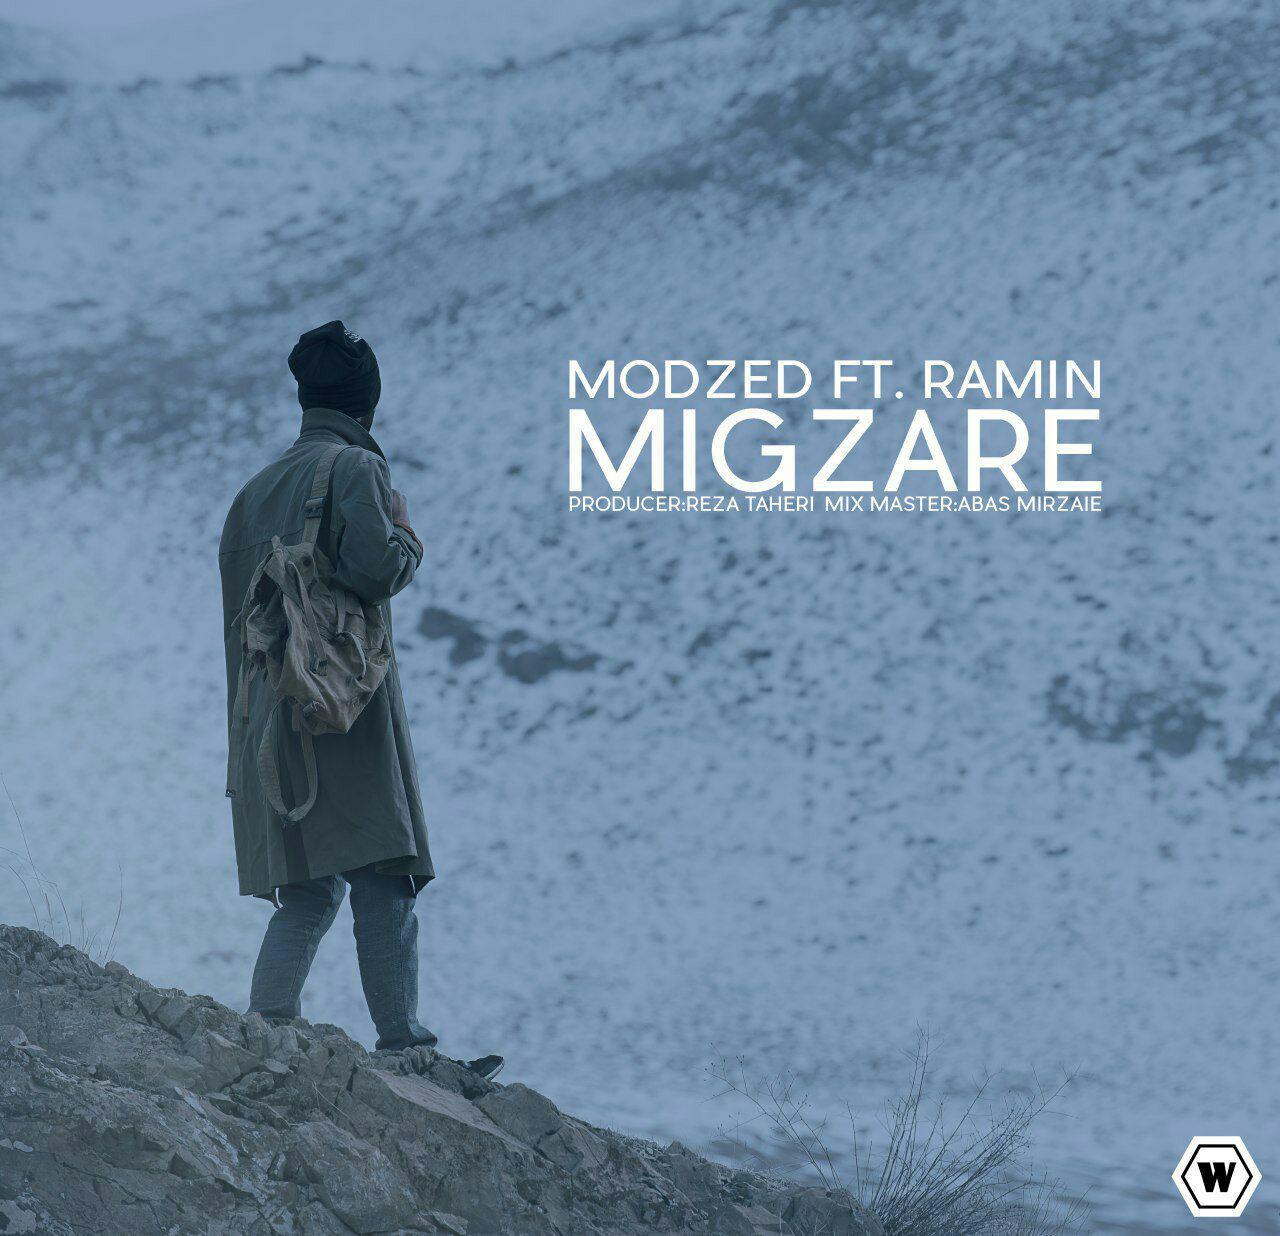 Modzed – Migzare (Ft Ramin)